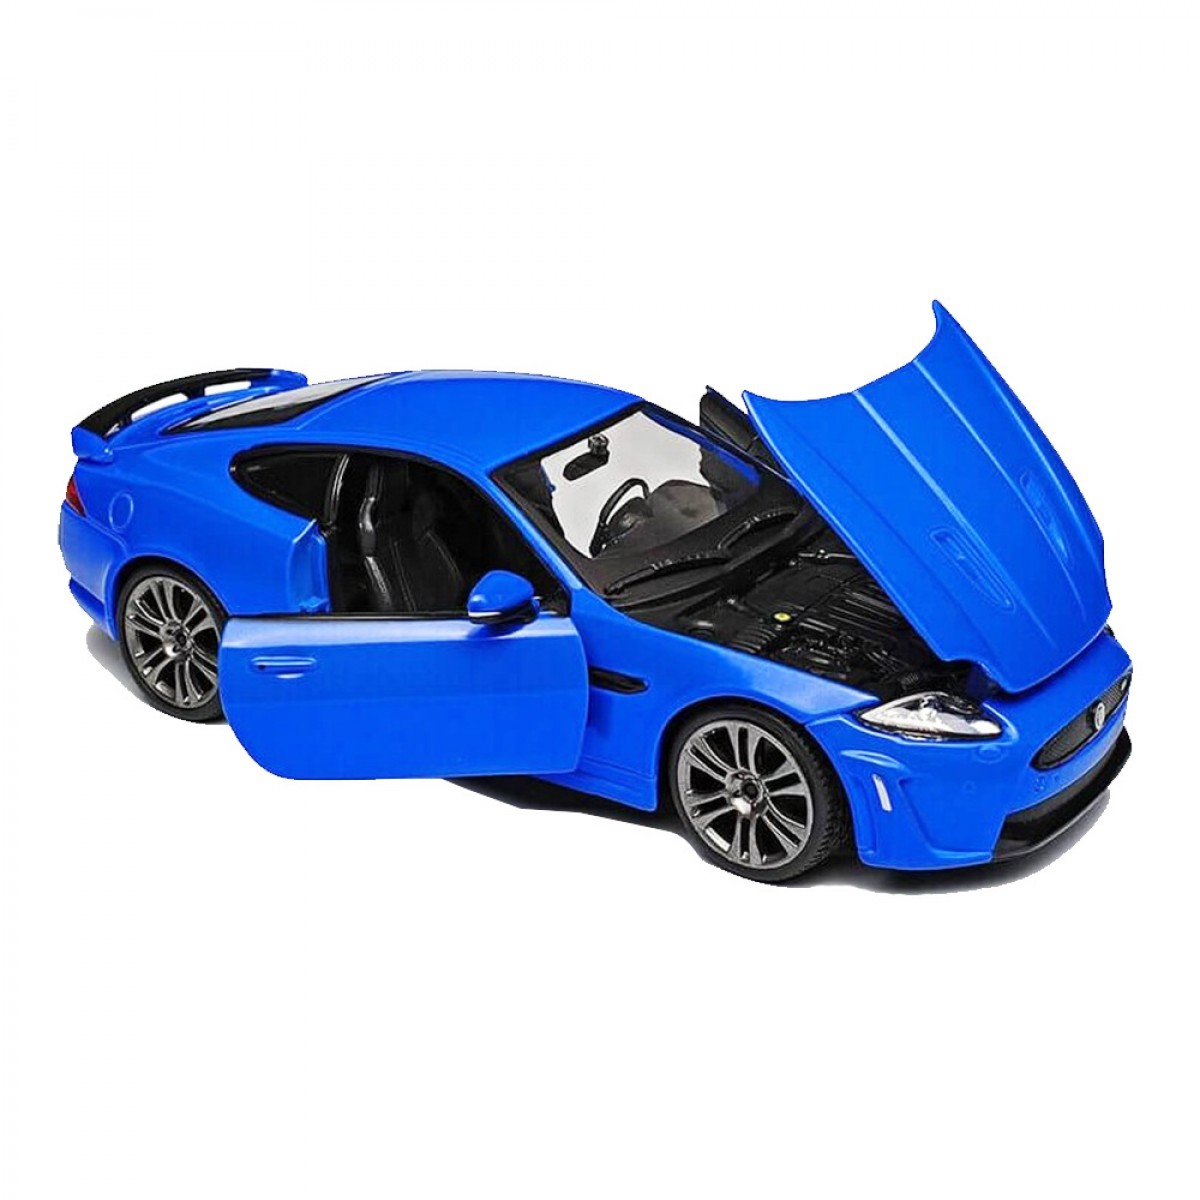 BURAGO ΜΕΤΑΛΛΙΚΑ ΑΥΤΟΚΙΝΗΤΑ 1/24 PLUS JAGUAR XKR-S BLUE 18-21063